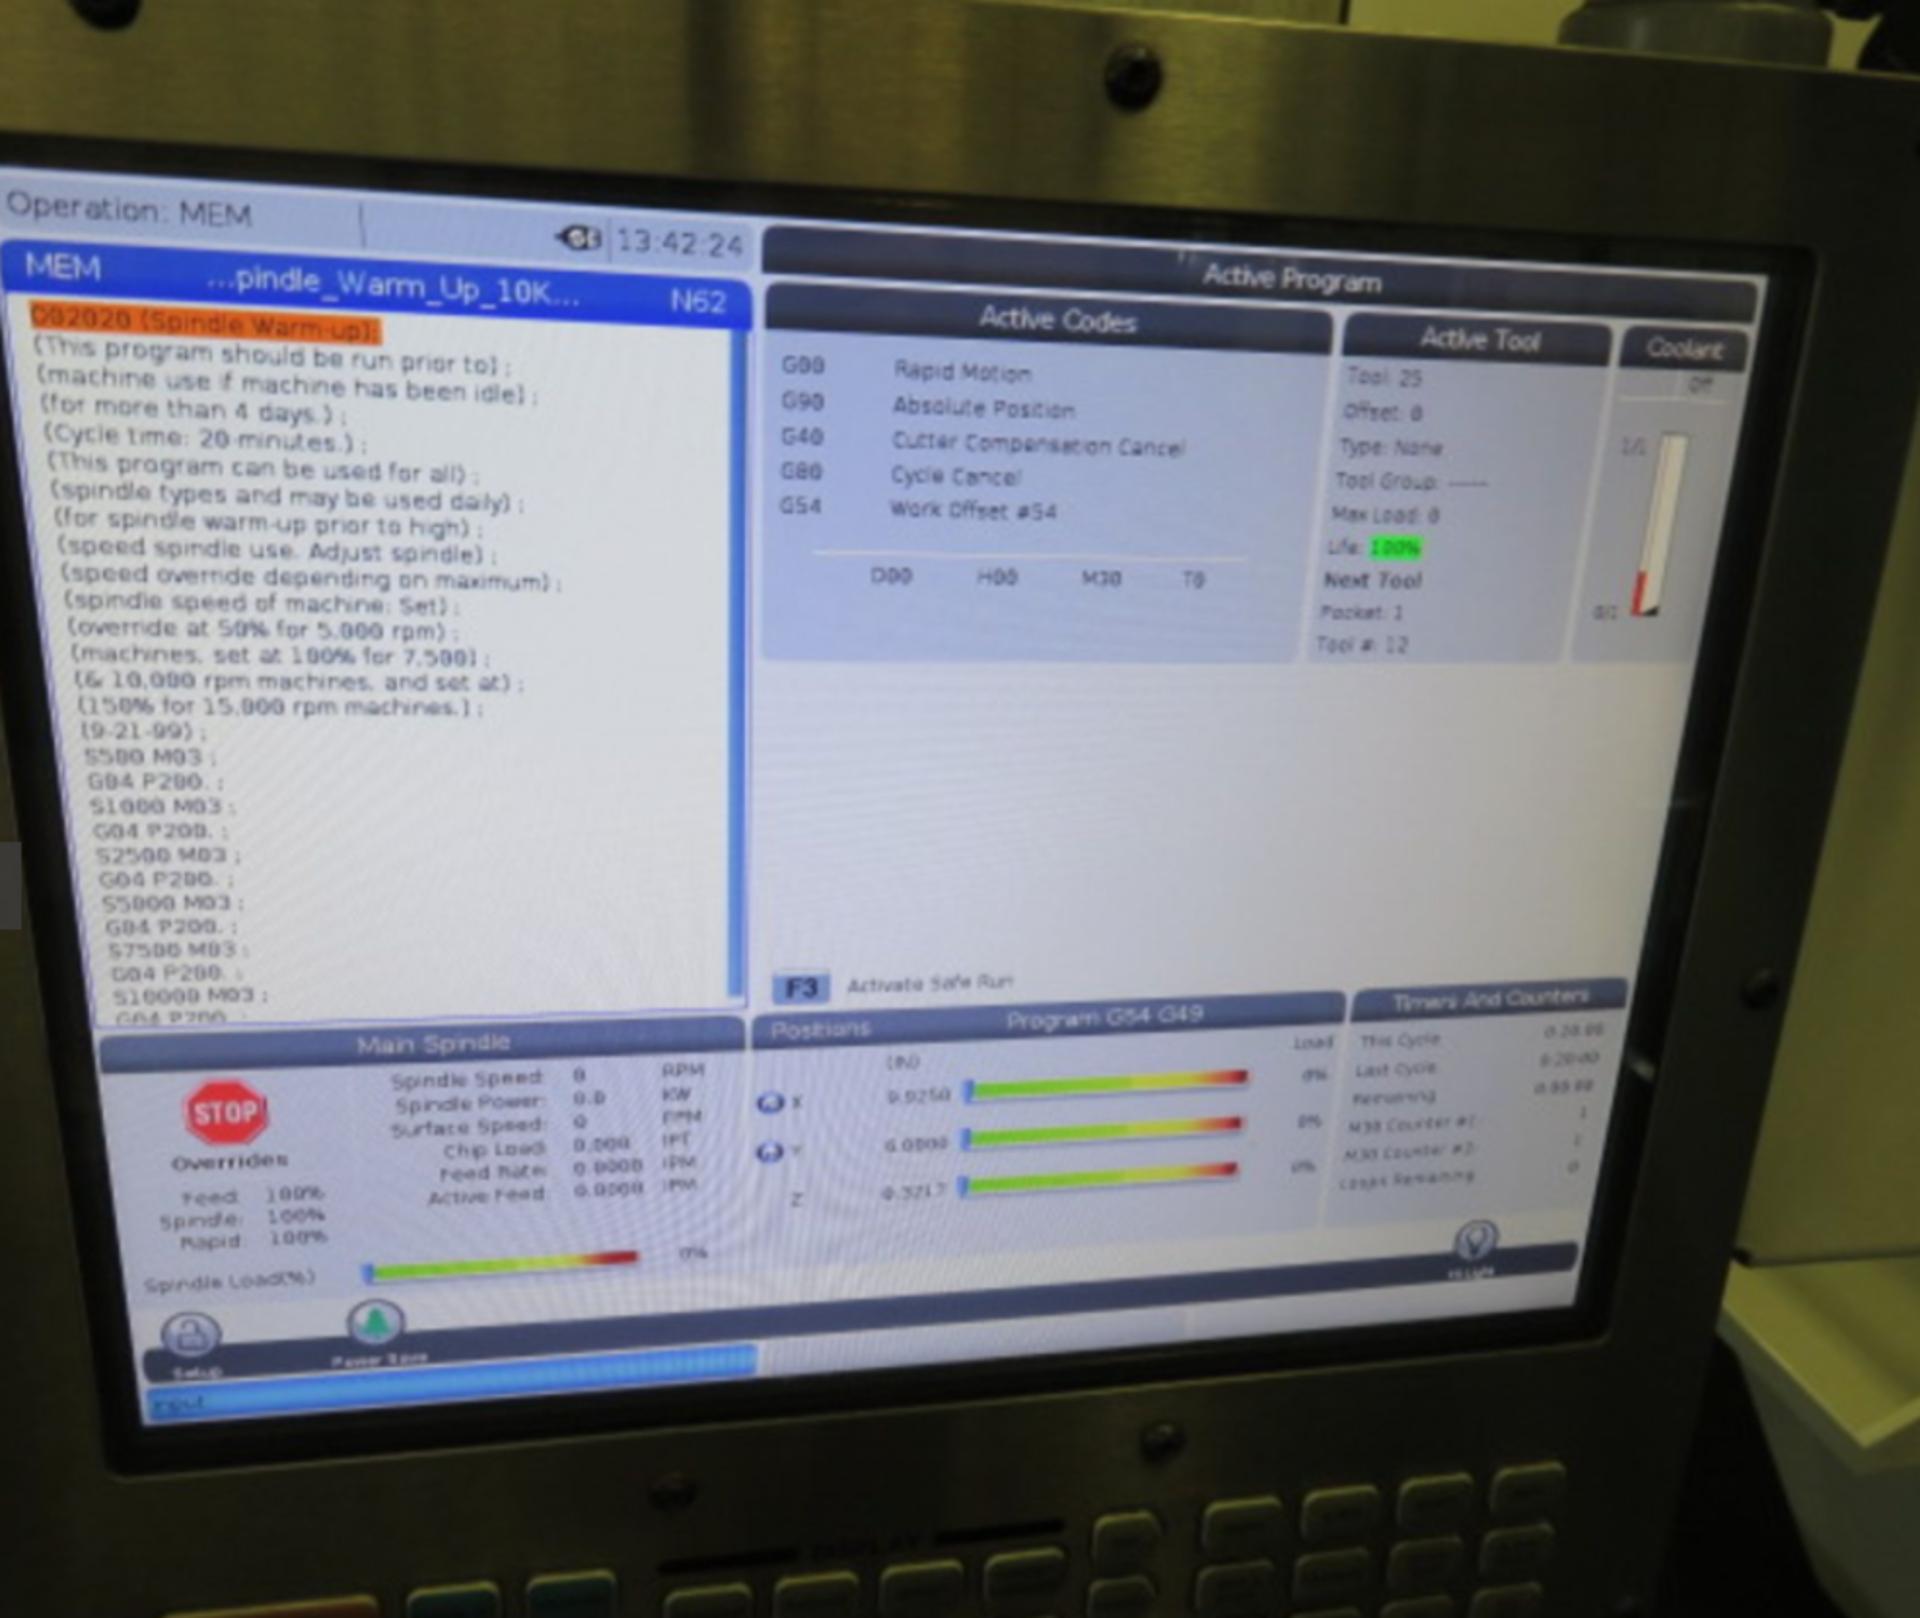 Lot 23 - 2017 HAAS VF-1 CNC VERTICAL MACHINING CENTER